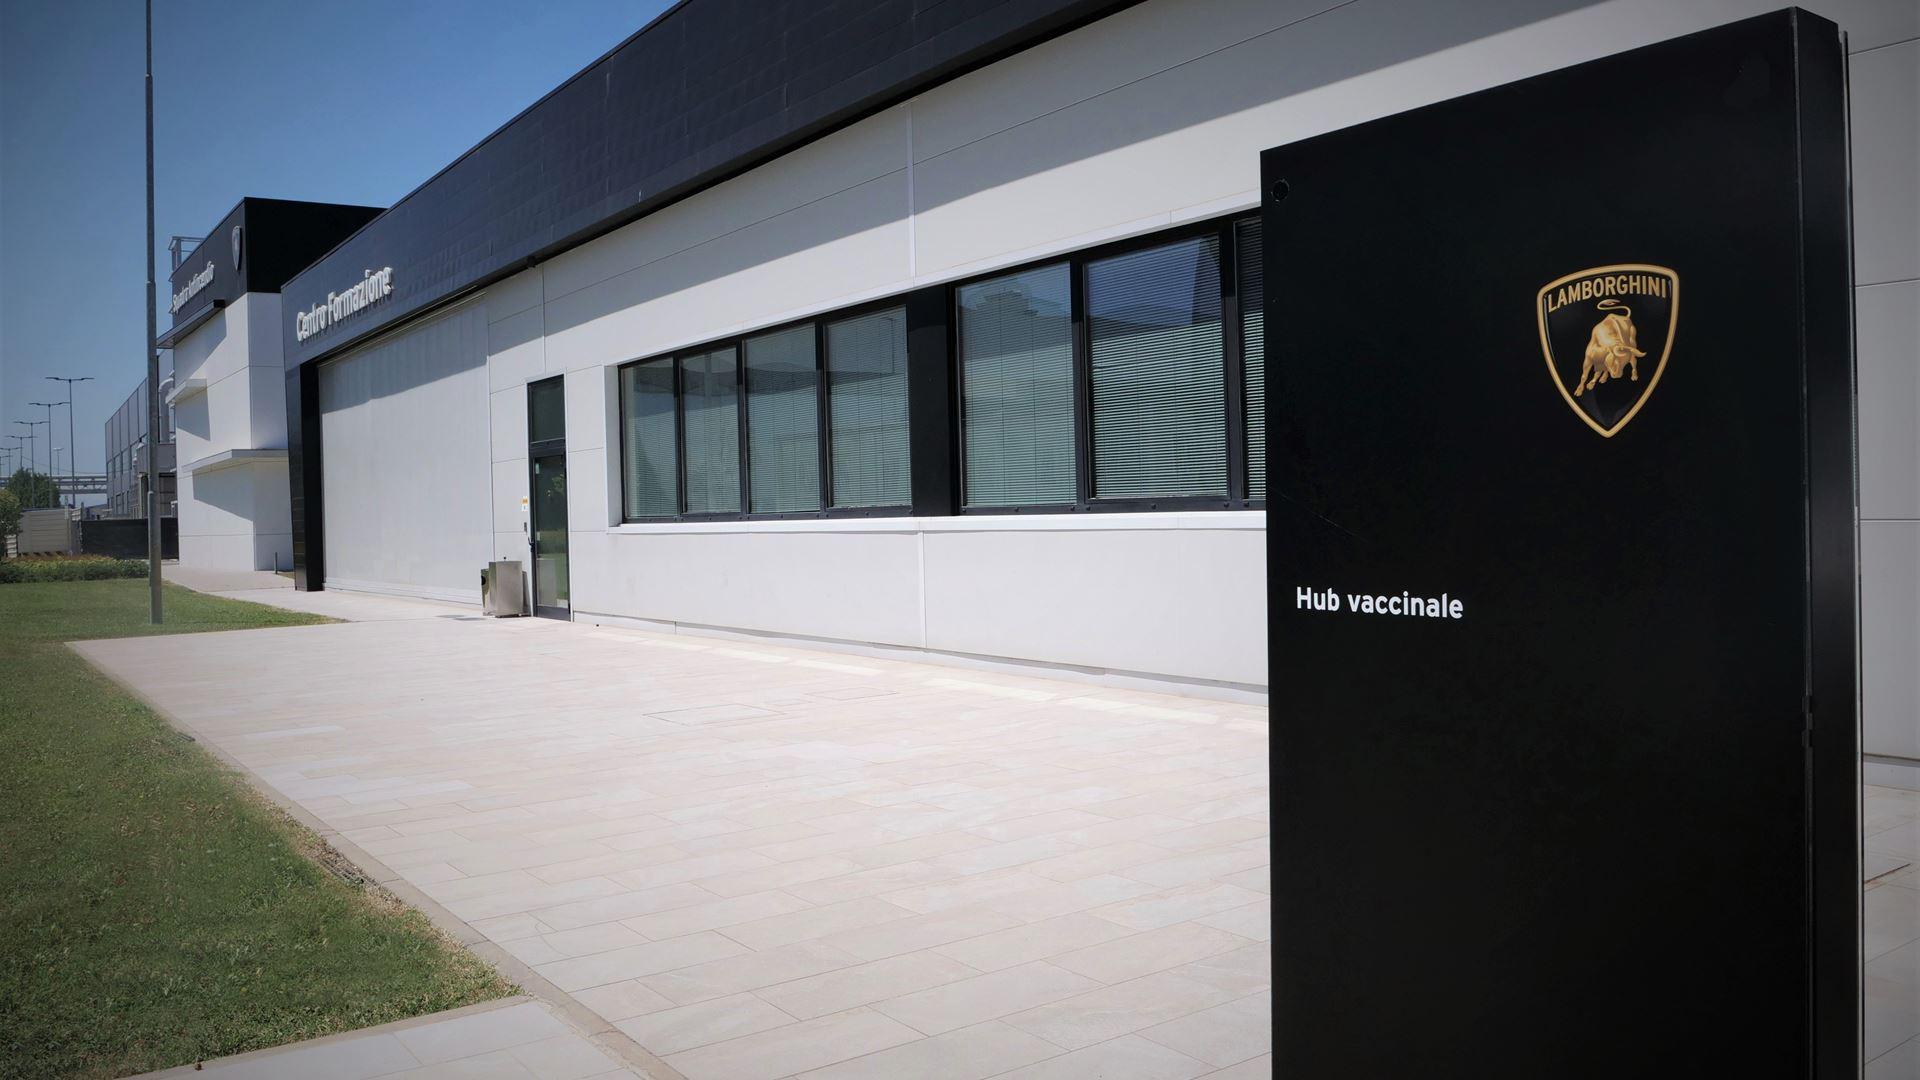 Automobili Lamborghini opens the company vaccination centre - All employees vaccinated in three day - Image 5